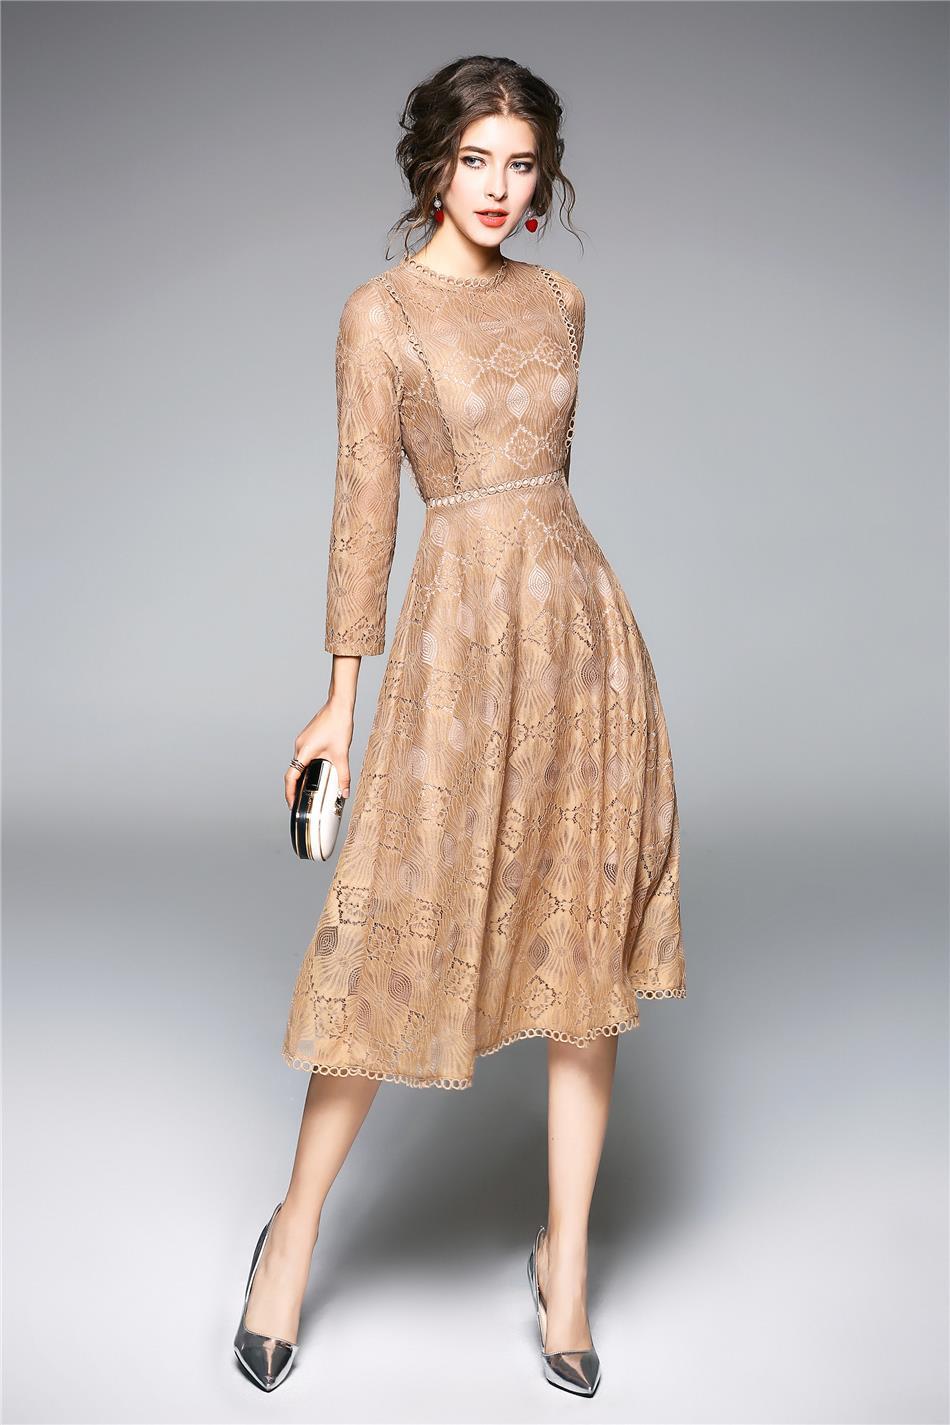 Bayan  elbise  tasarım ,bayan elbise,kalem elbise,elbise modelleri,ucuz elbise,online elbise